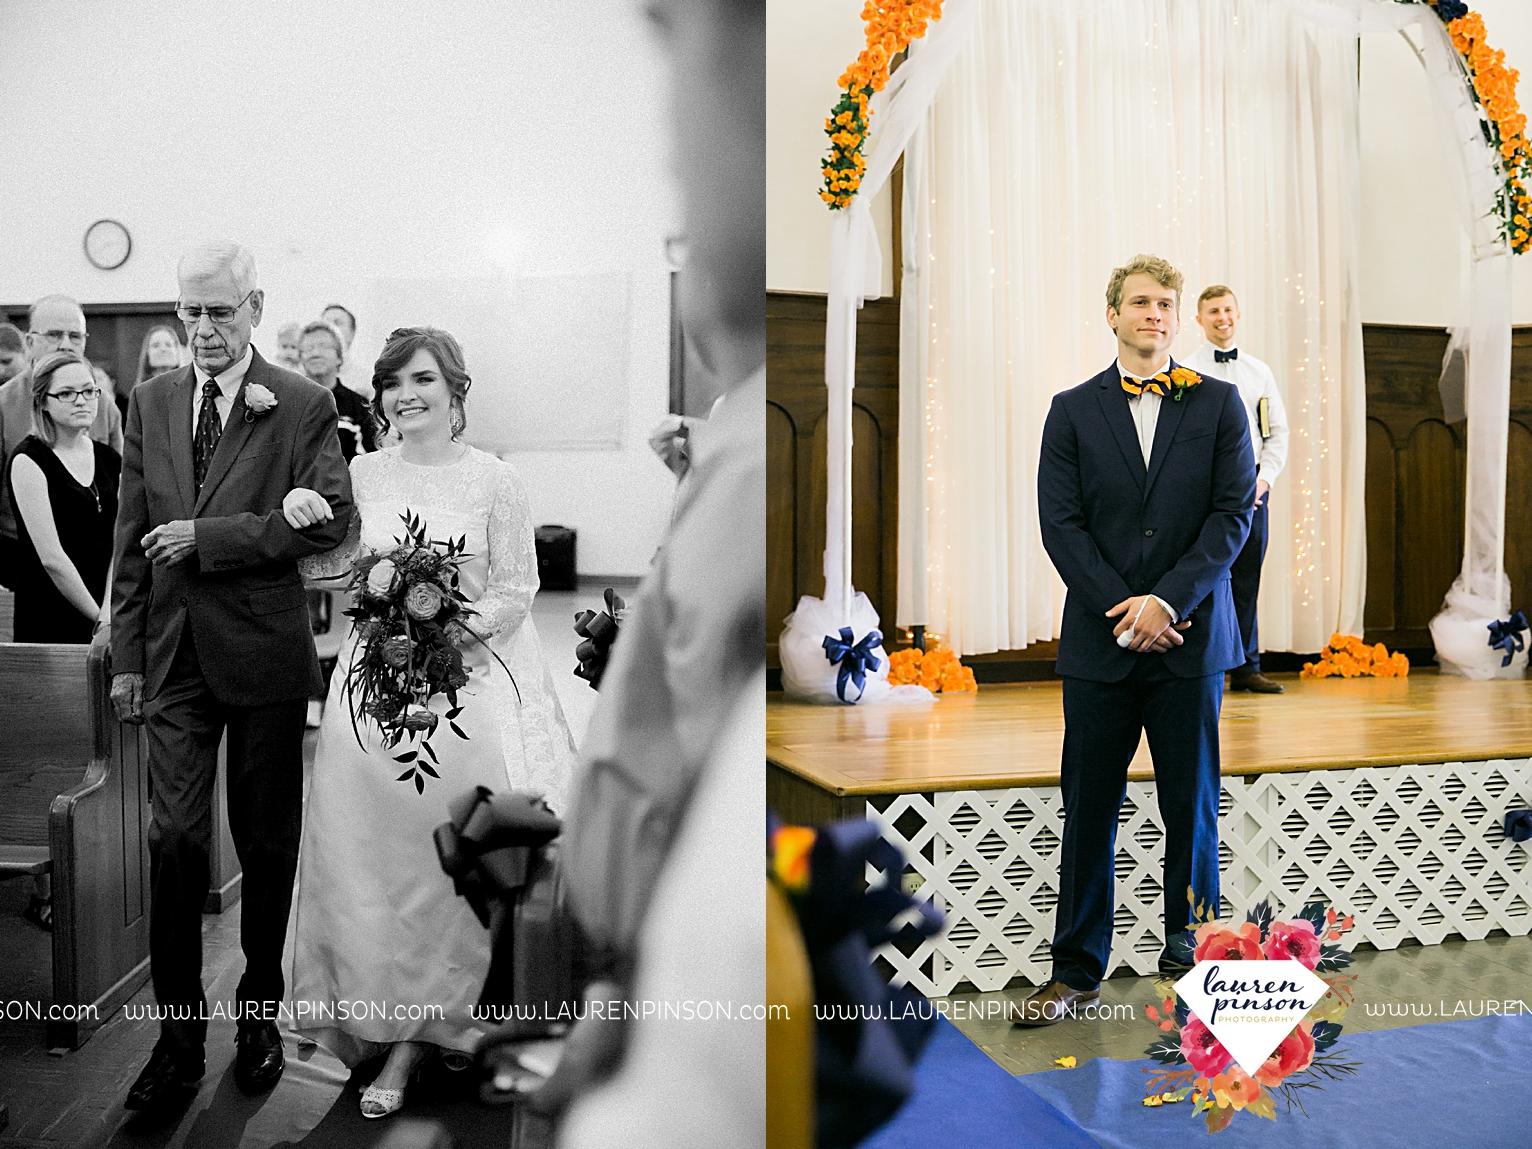 wichita-falls-texas-wedding-photographer-vintage-off-beat-bride-faith-village-church-of-christ-the-plex-roller-skating_2408.jpg